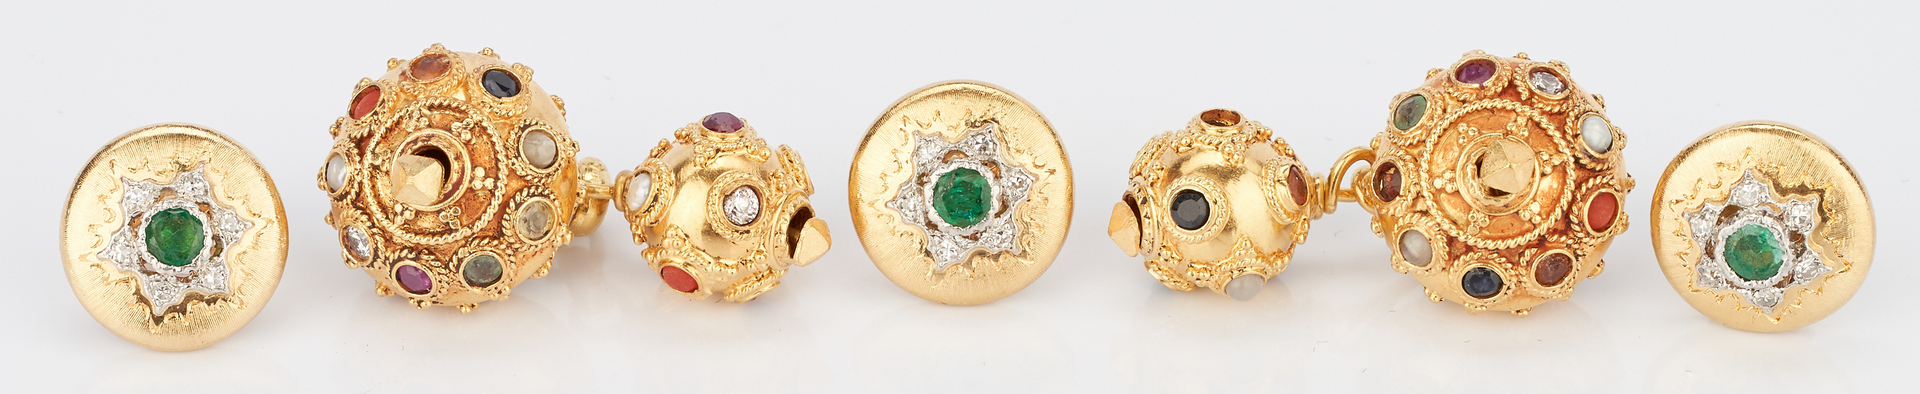 Lot 723: Three 18K Buccellati Button Cuffs & Pr. 18K Multistone Cufflinks